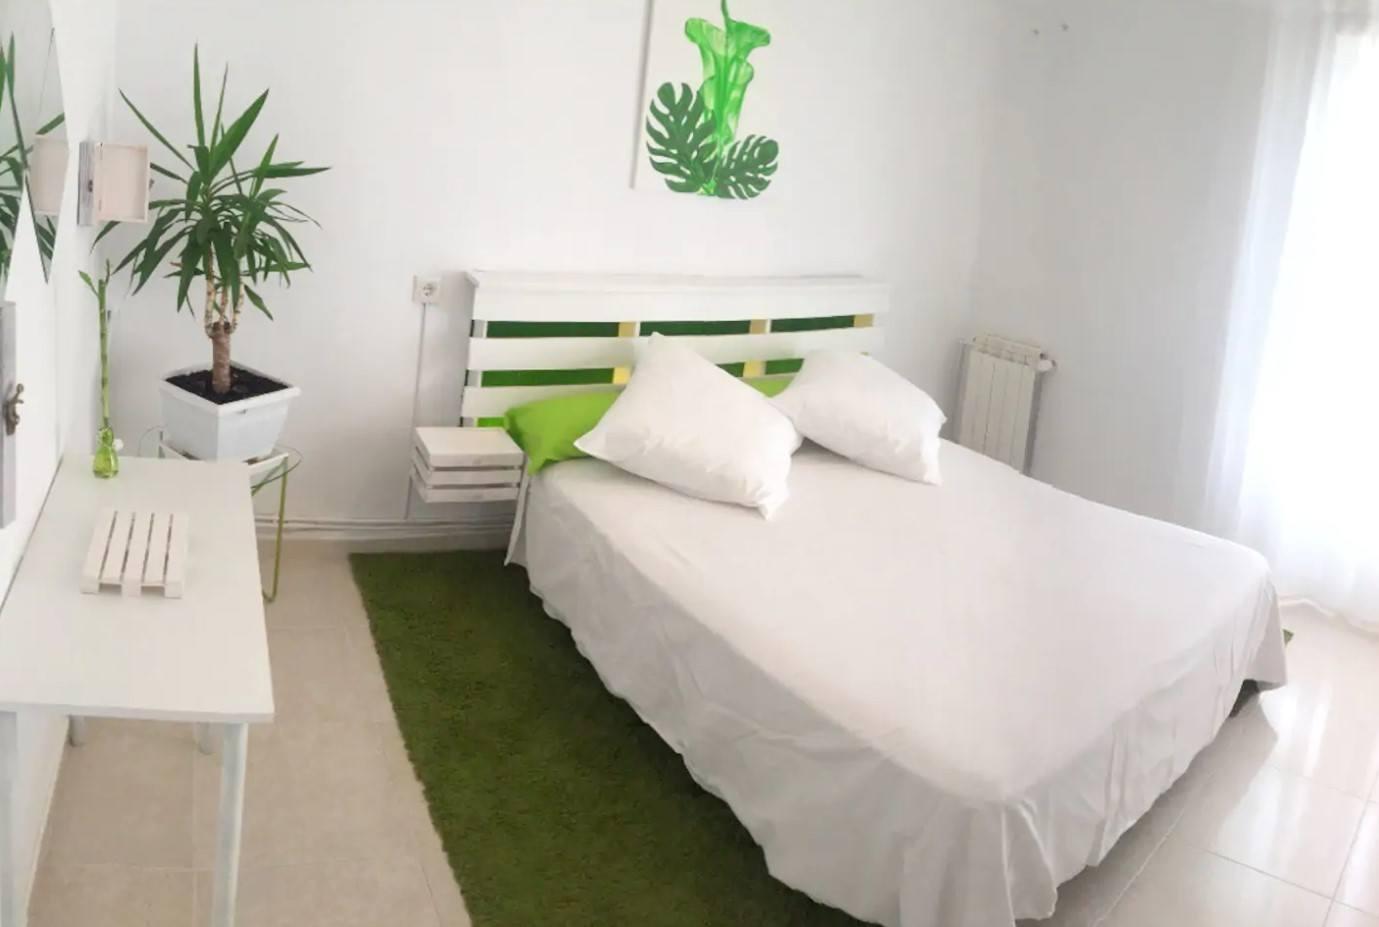 Alberto & Tito's BnB Best Hostel in Toledo